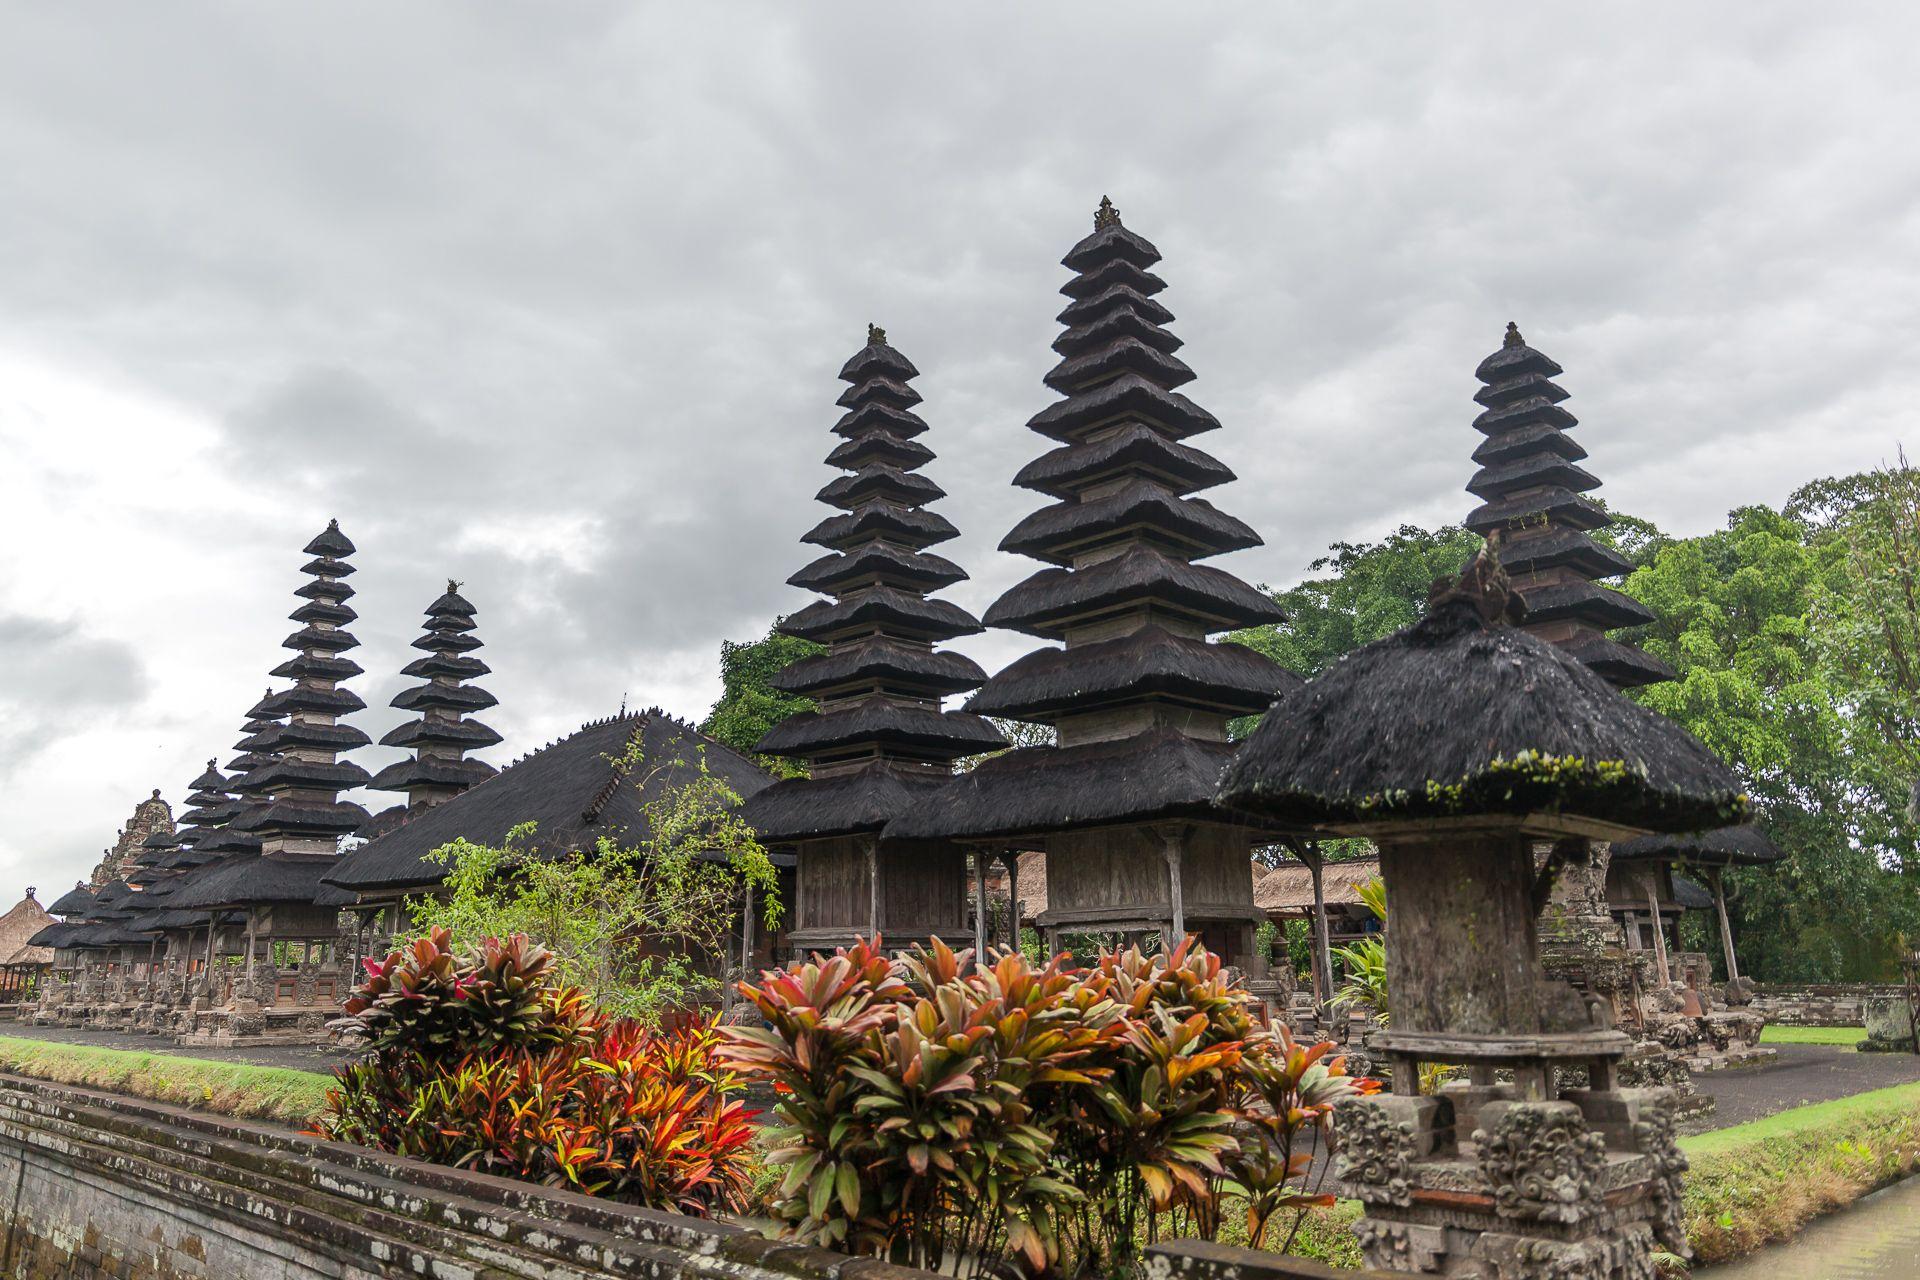 Bali, Indonesia, Pura Taman Aun, Taman Aun Temple, Бали, развлечения на Бали, экскурсии на Бали, рисовые поля на Бали, рисовые плантации на Бали, рисовые террасы на Бали, тегалаланг, тегаллаланг бали, что посмотреть на Бали, достопримечательности Бали, культура бали, рис на бали, фото на качелях Бали, где сделать фото на качелях на бали, инстаграм фото, Бали, Индонезия, храмы Бали, главные храмы Бали, Таман Аюн, Пура Таман Аюн, Храм Таман Аюн, остров богов и демонов, Бали остров богов и демонов, религия на Бали, достопримечательности Бали, что посмотреть на Бали, храмы Бали какие посмотреть, место для фотосессий на Бали, инстаграм фото Бали,